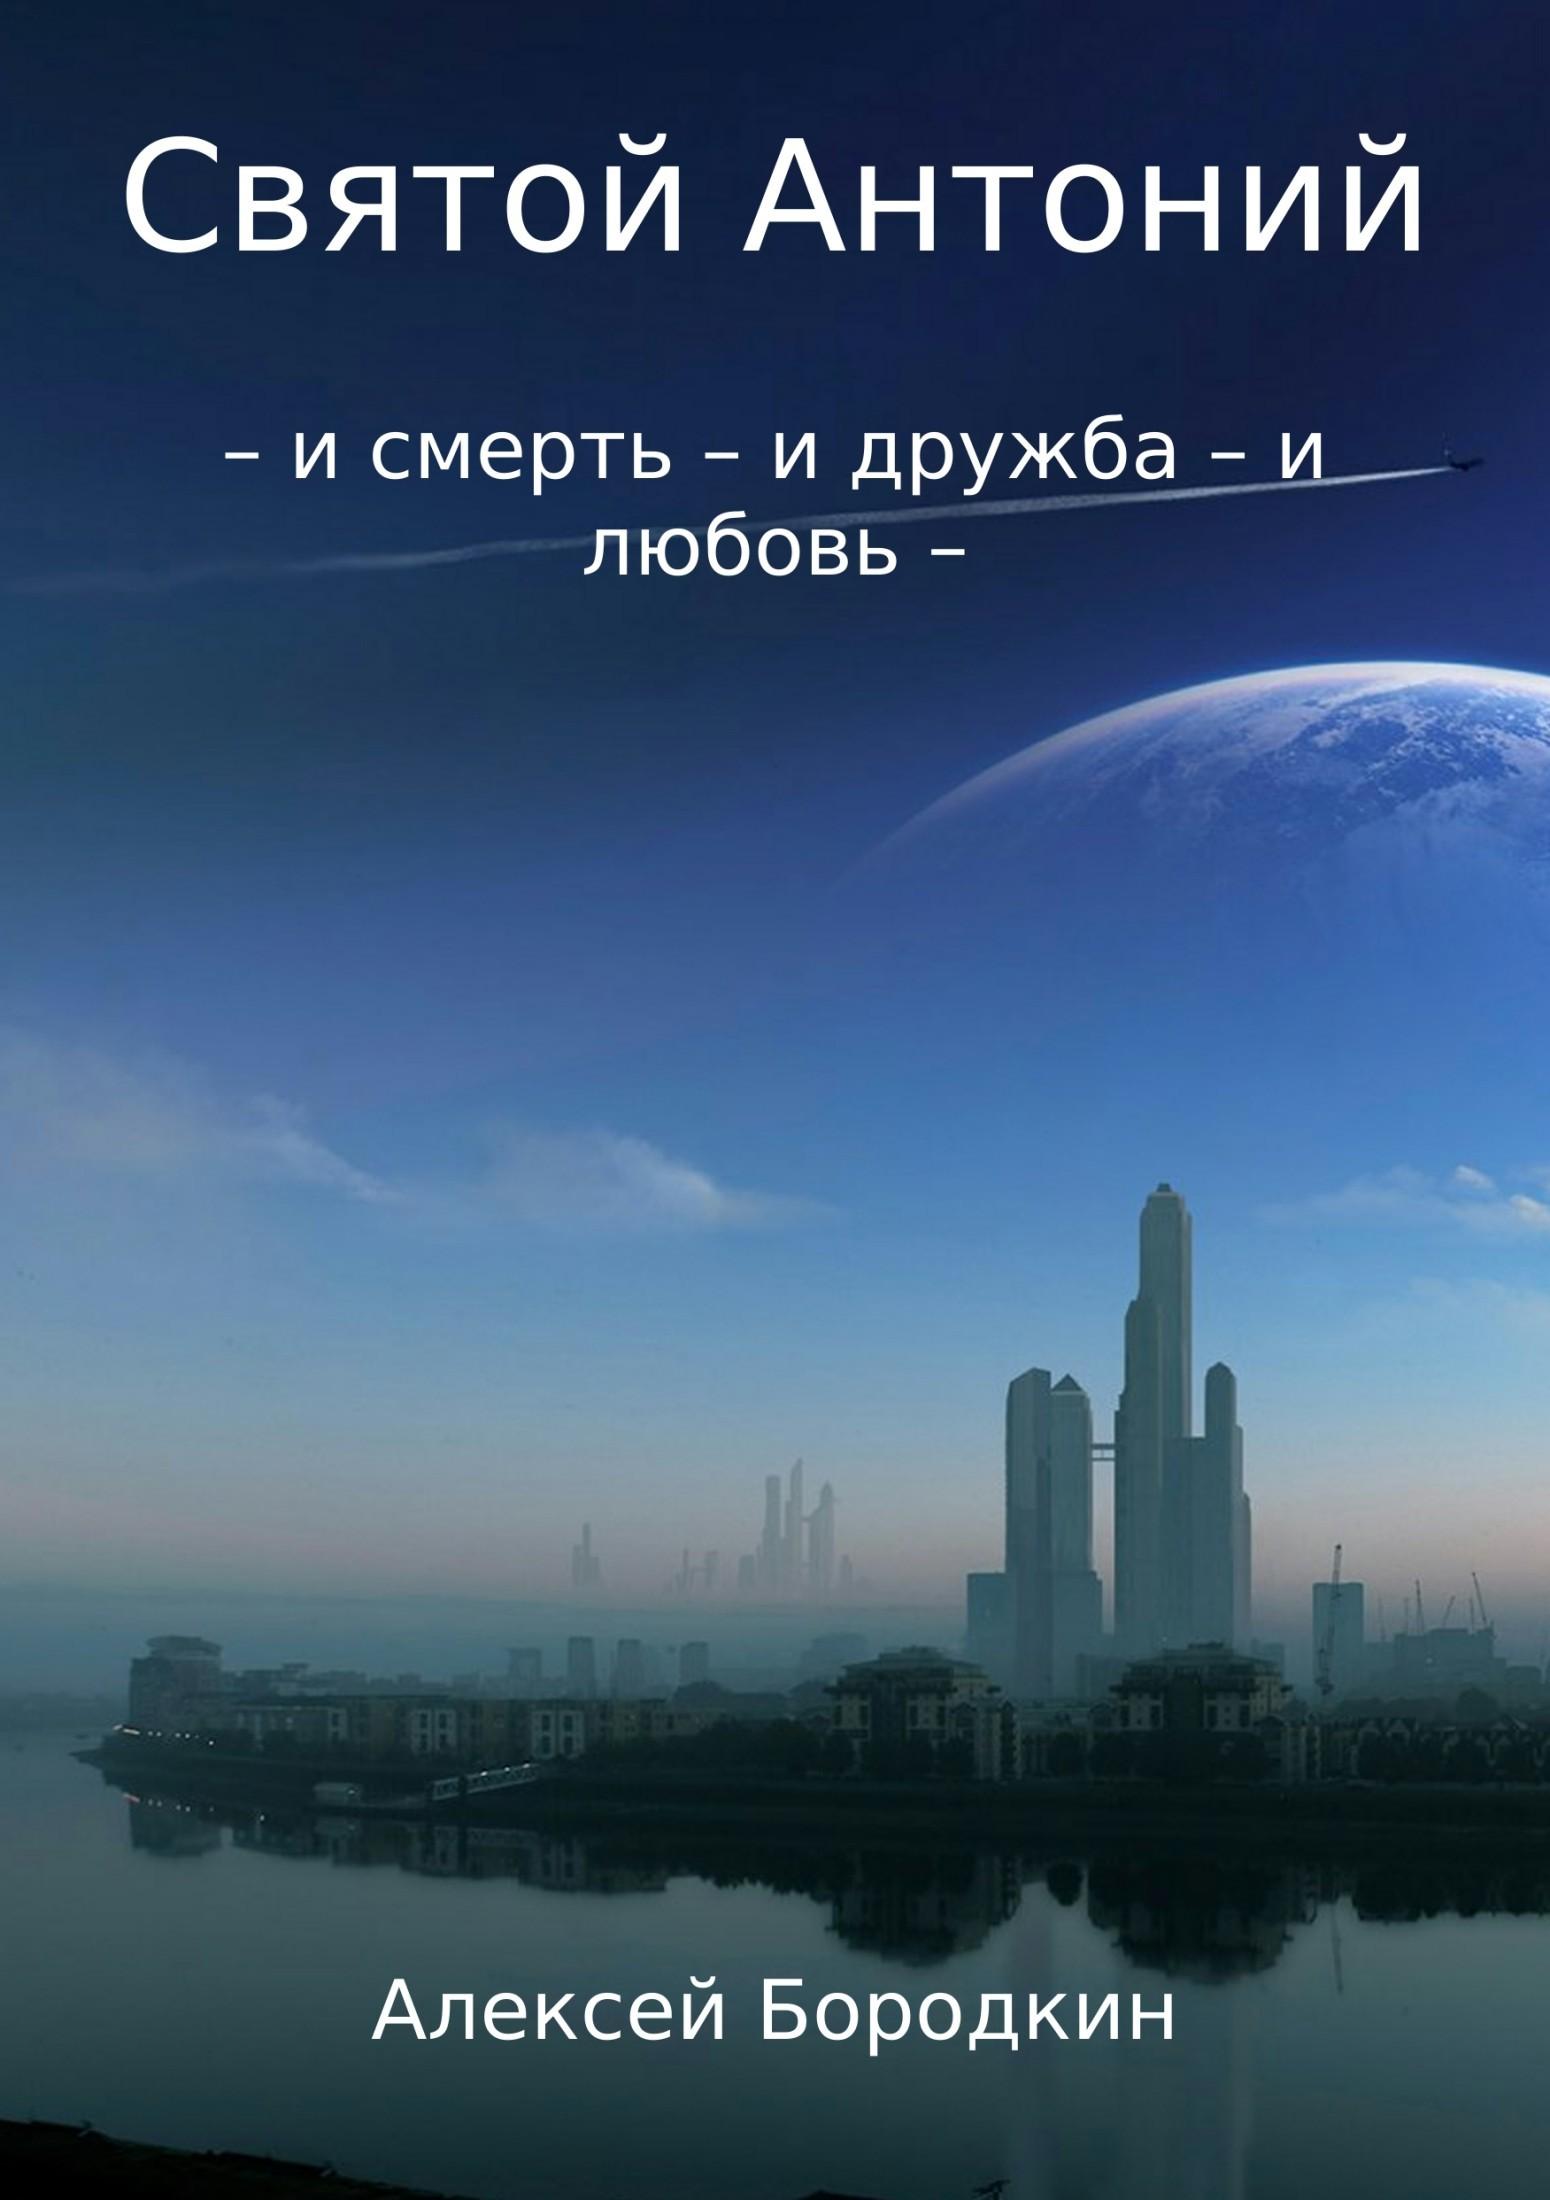 Алексей Петрович Бородкин Святой Антоний алексей петрович бородкин святой антоний